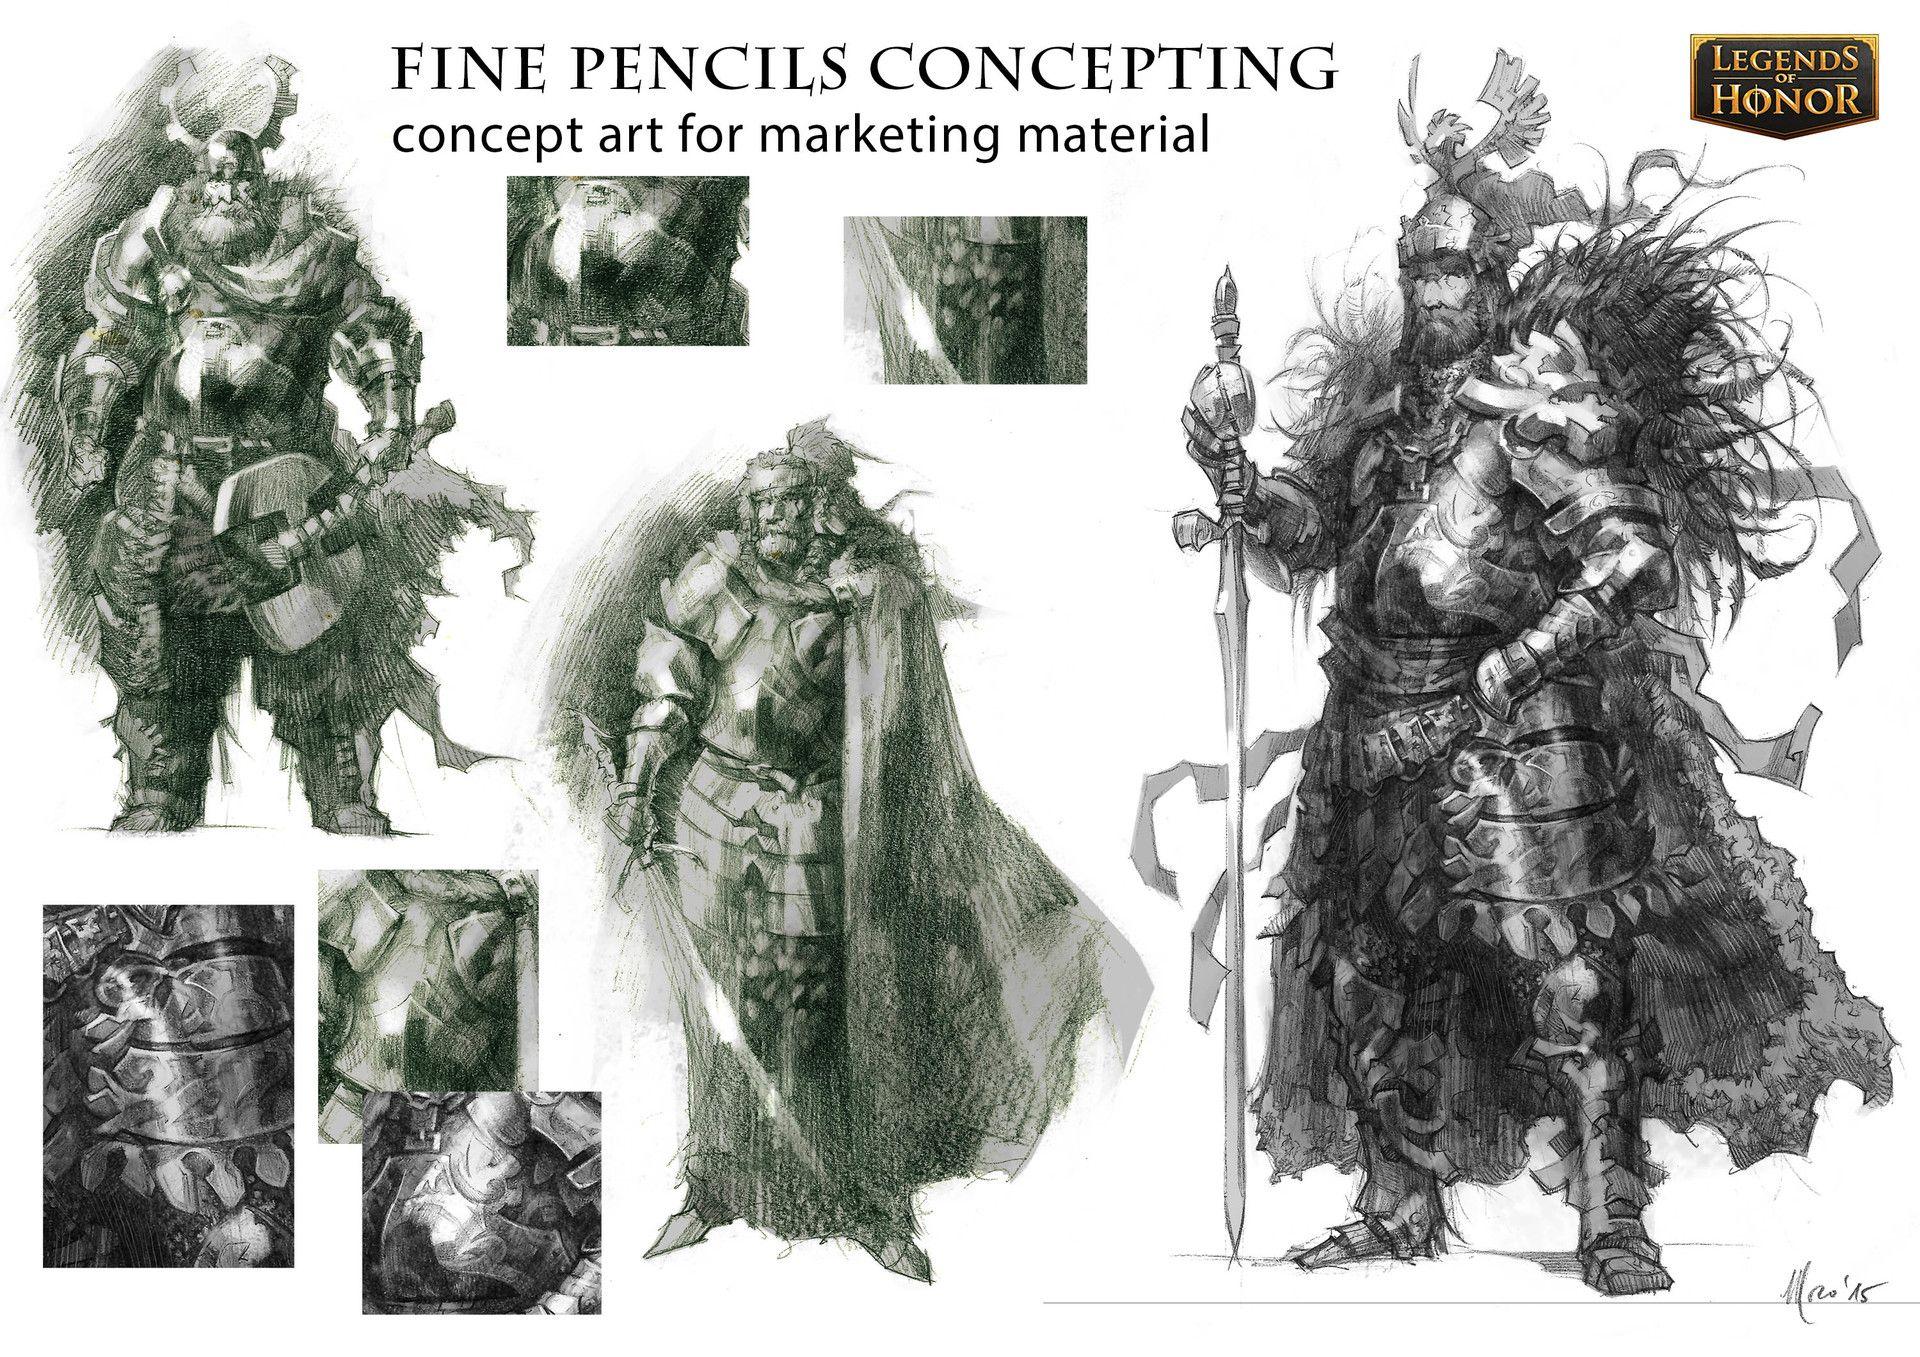 ArtStation - Fine pencils concepting, Stefano Moroni